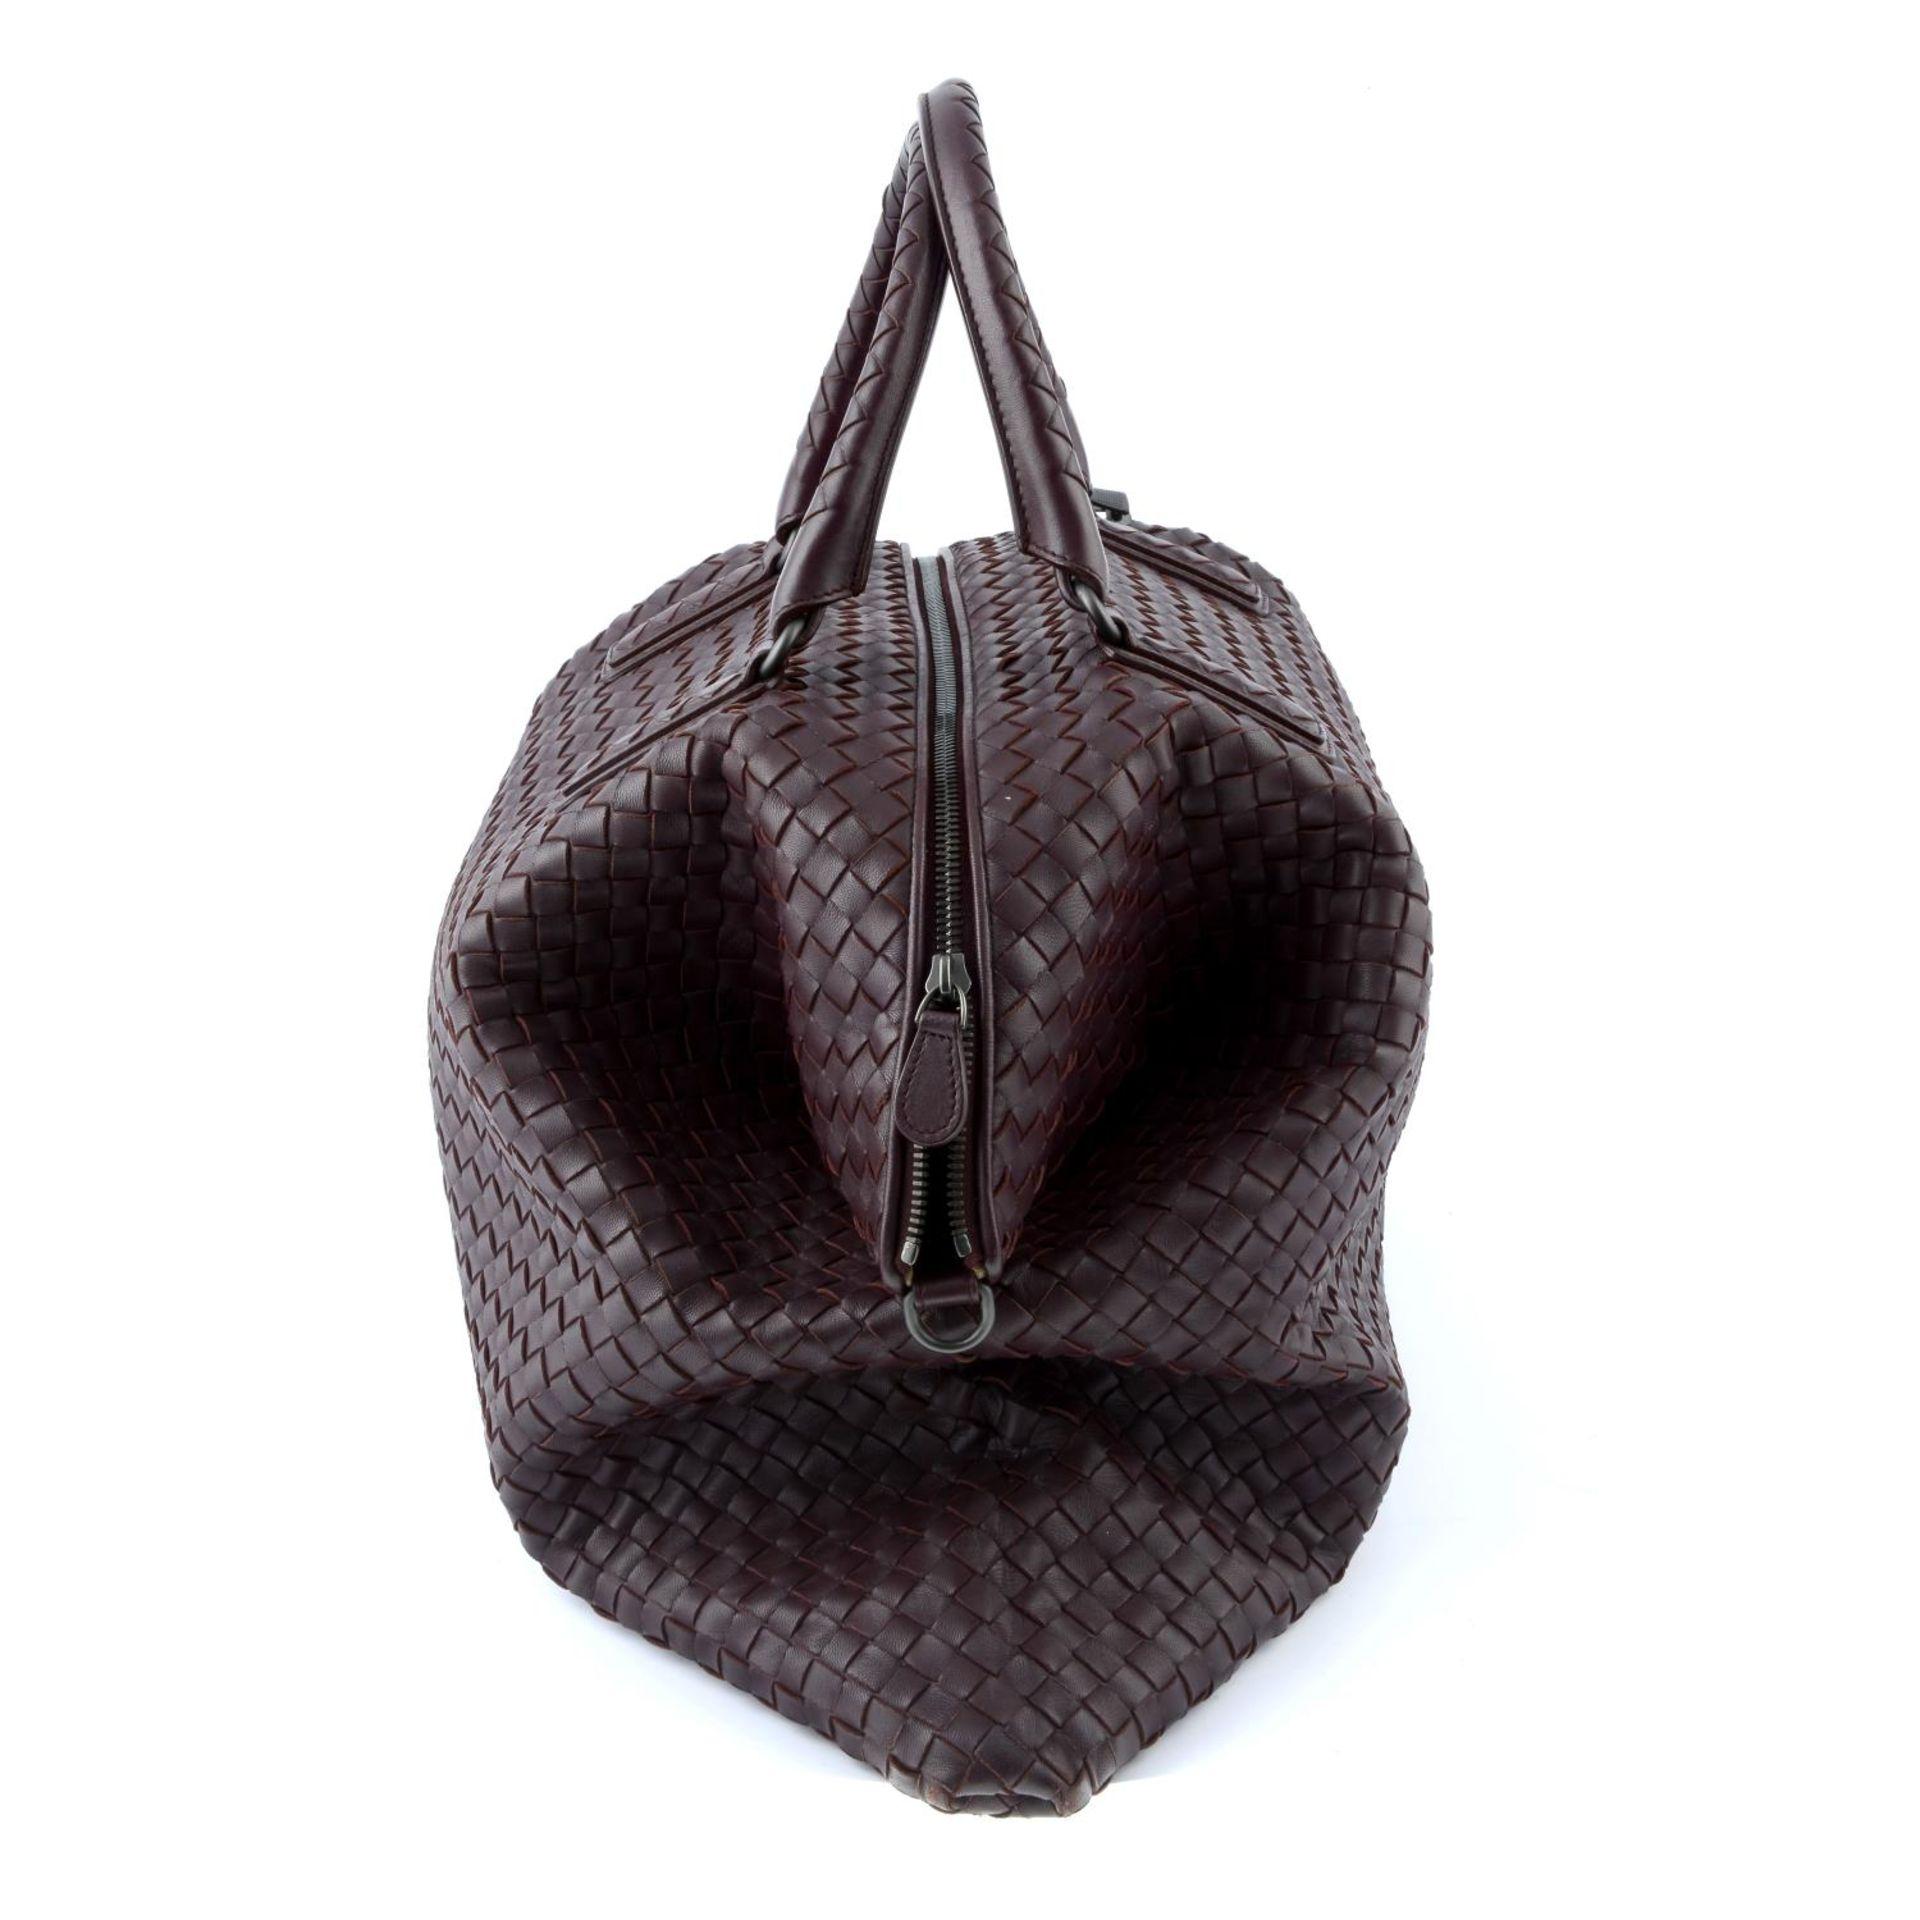 BOTTEGA VENETA - an XL fold over Nappa Intrecciato handbag. - Image 4 of 5